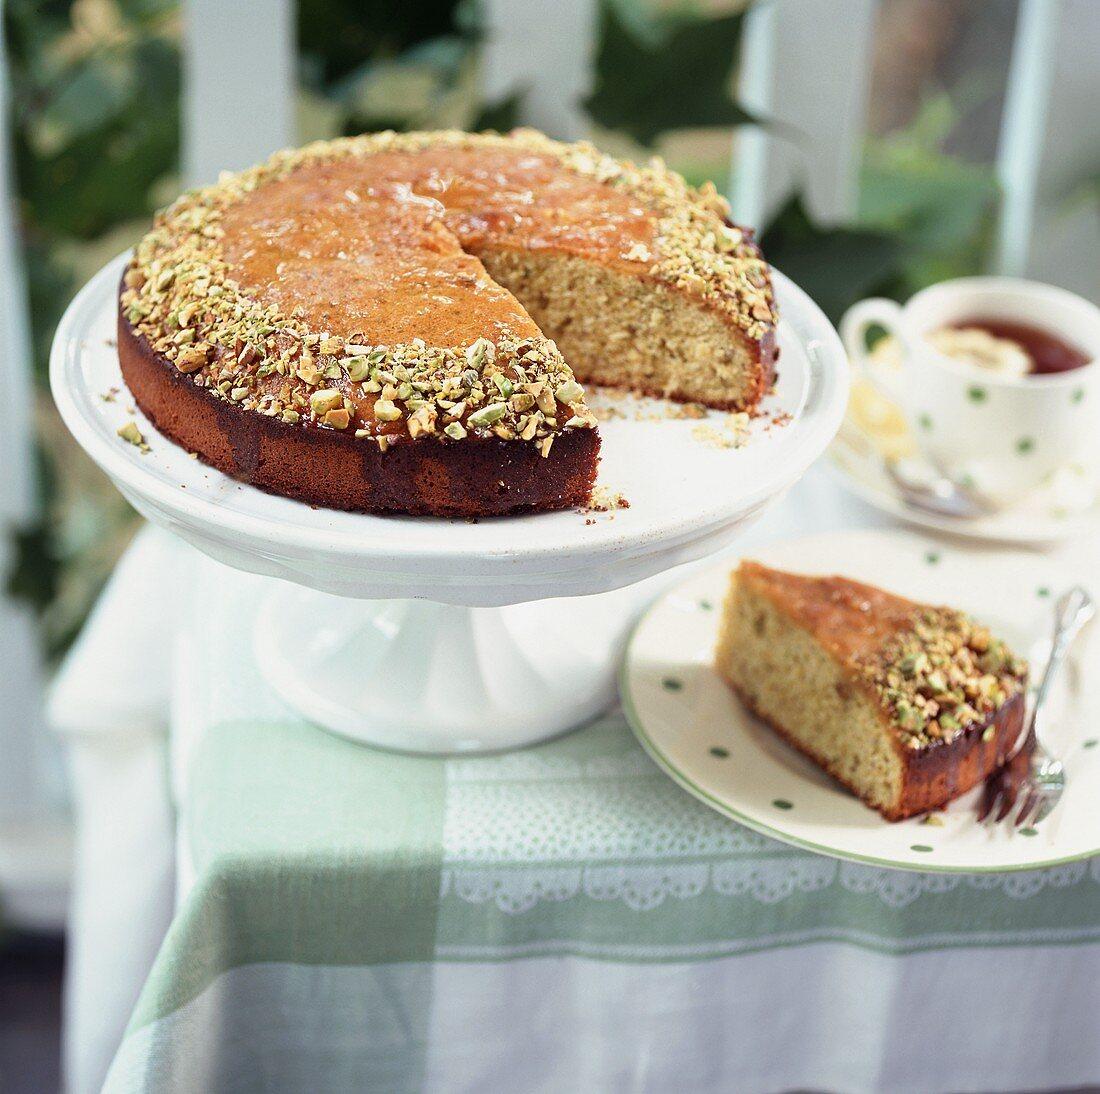 Honey and pistachio cake to serve with tea